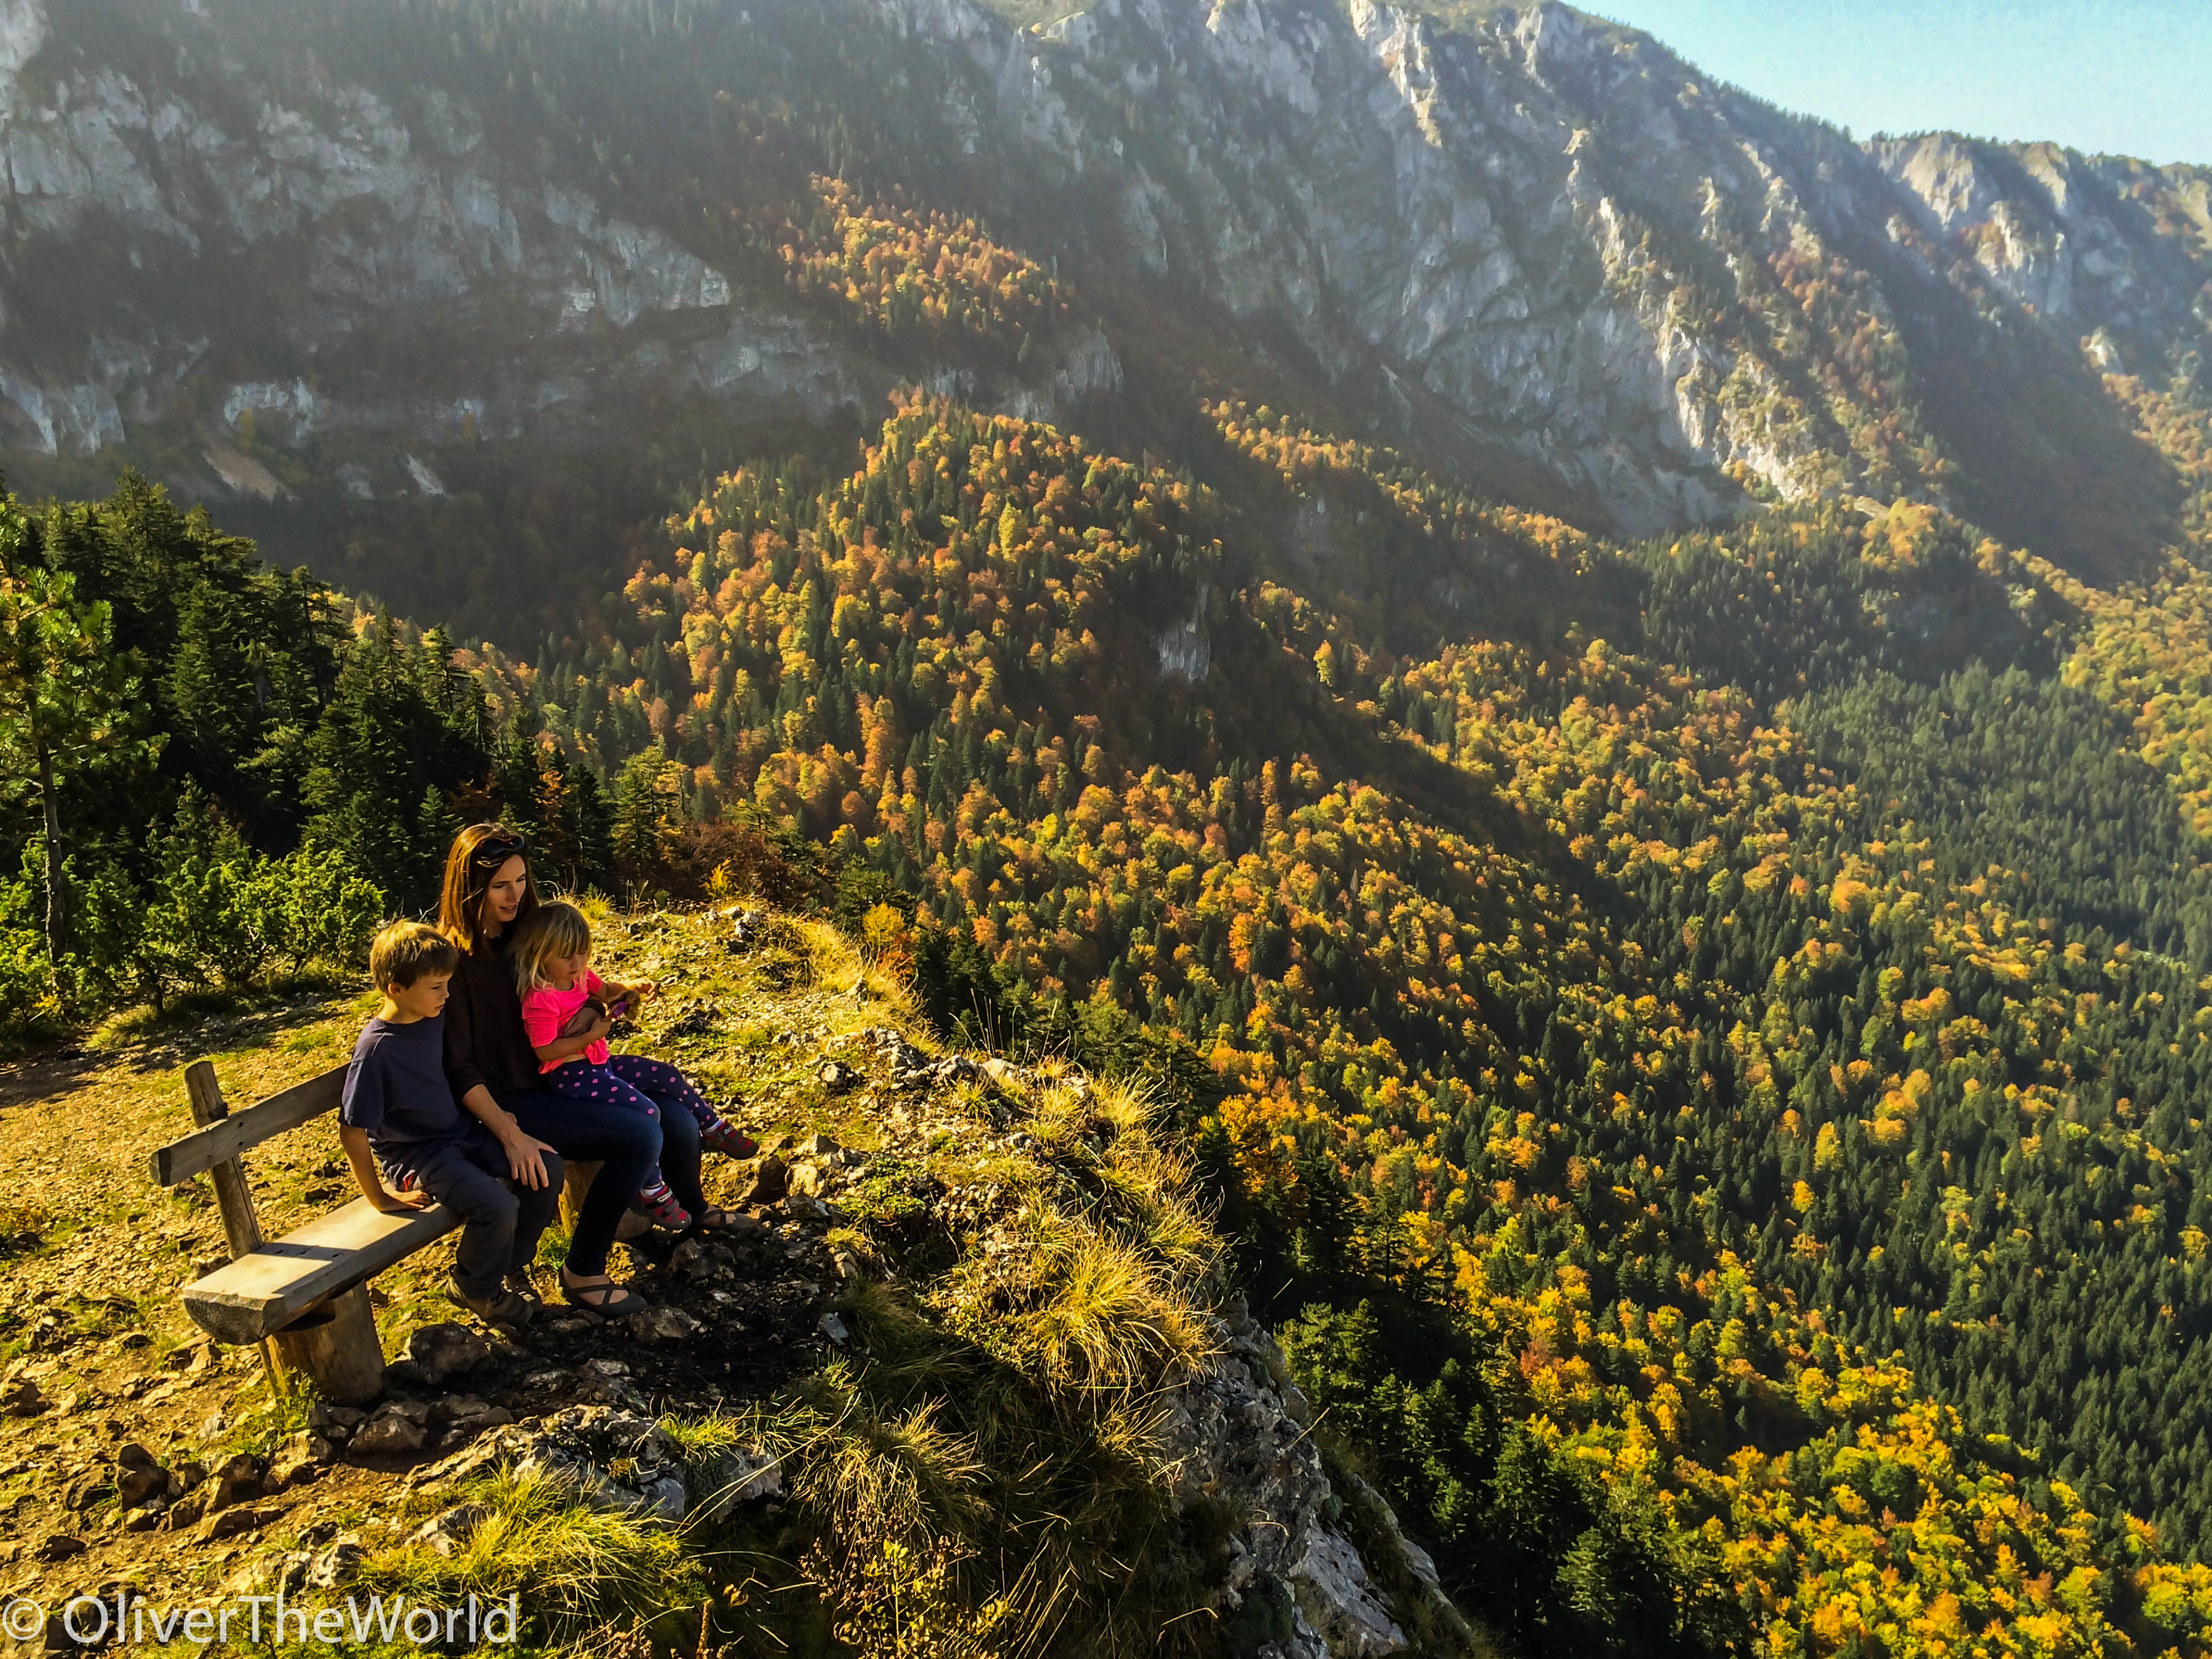 The edge of Durmitor, Montenegro